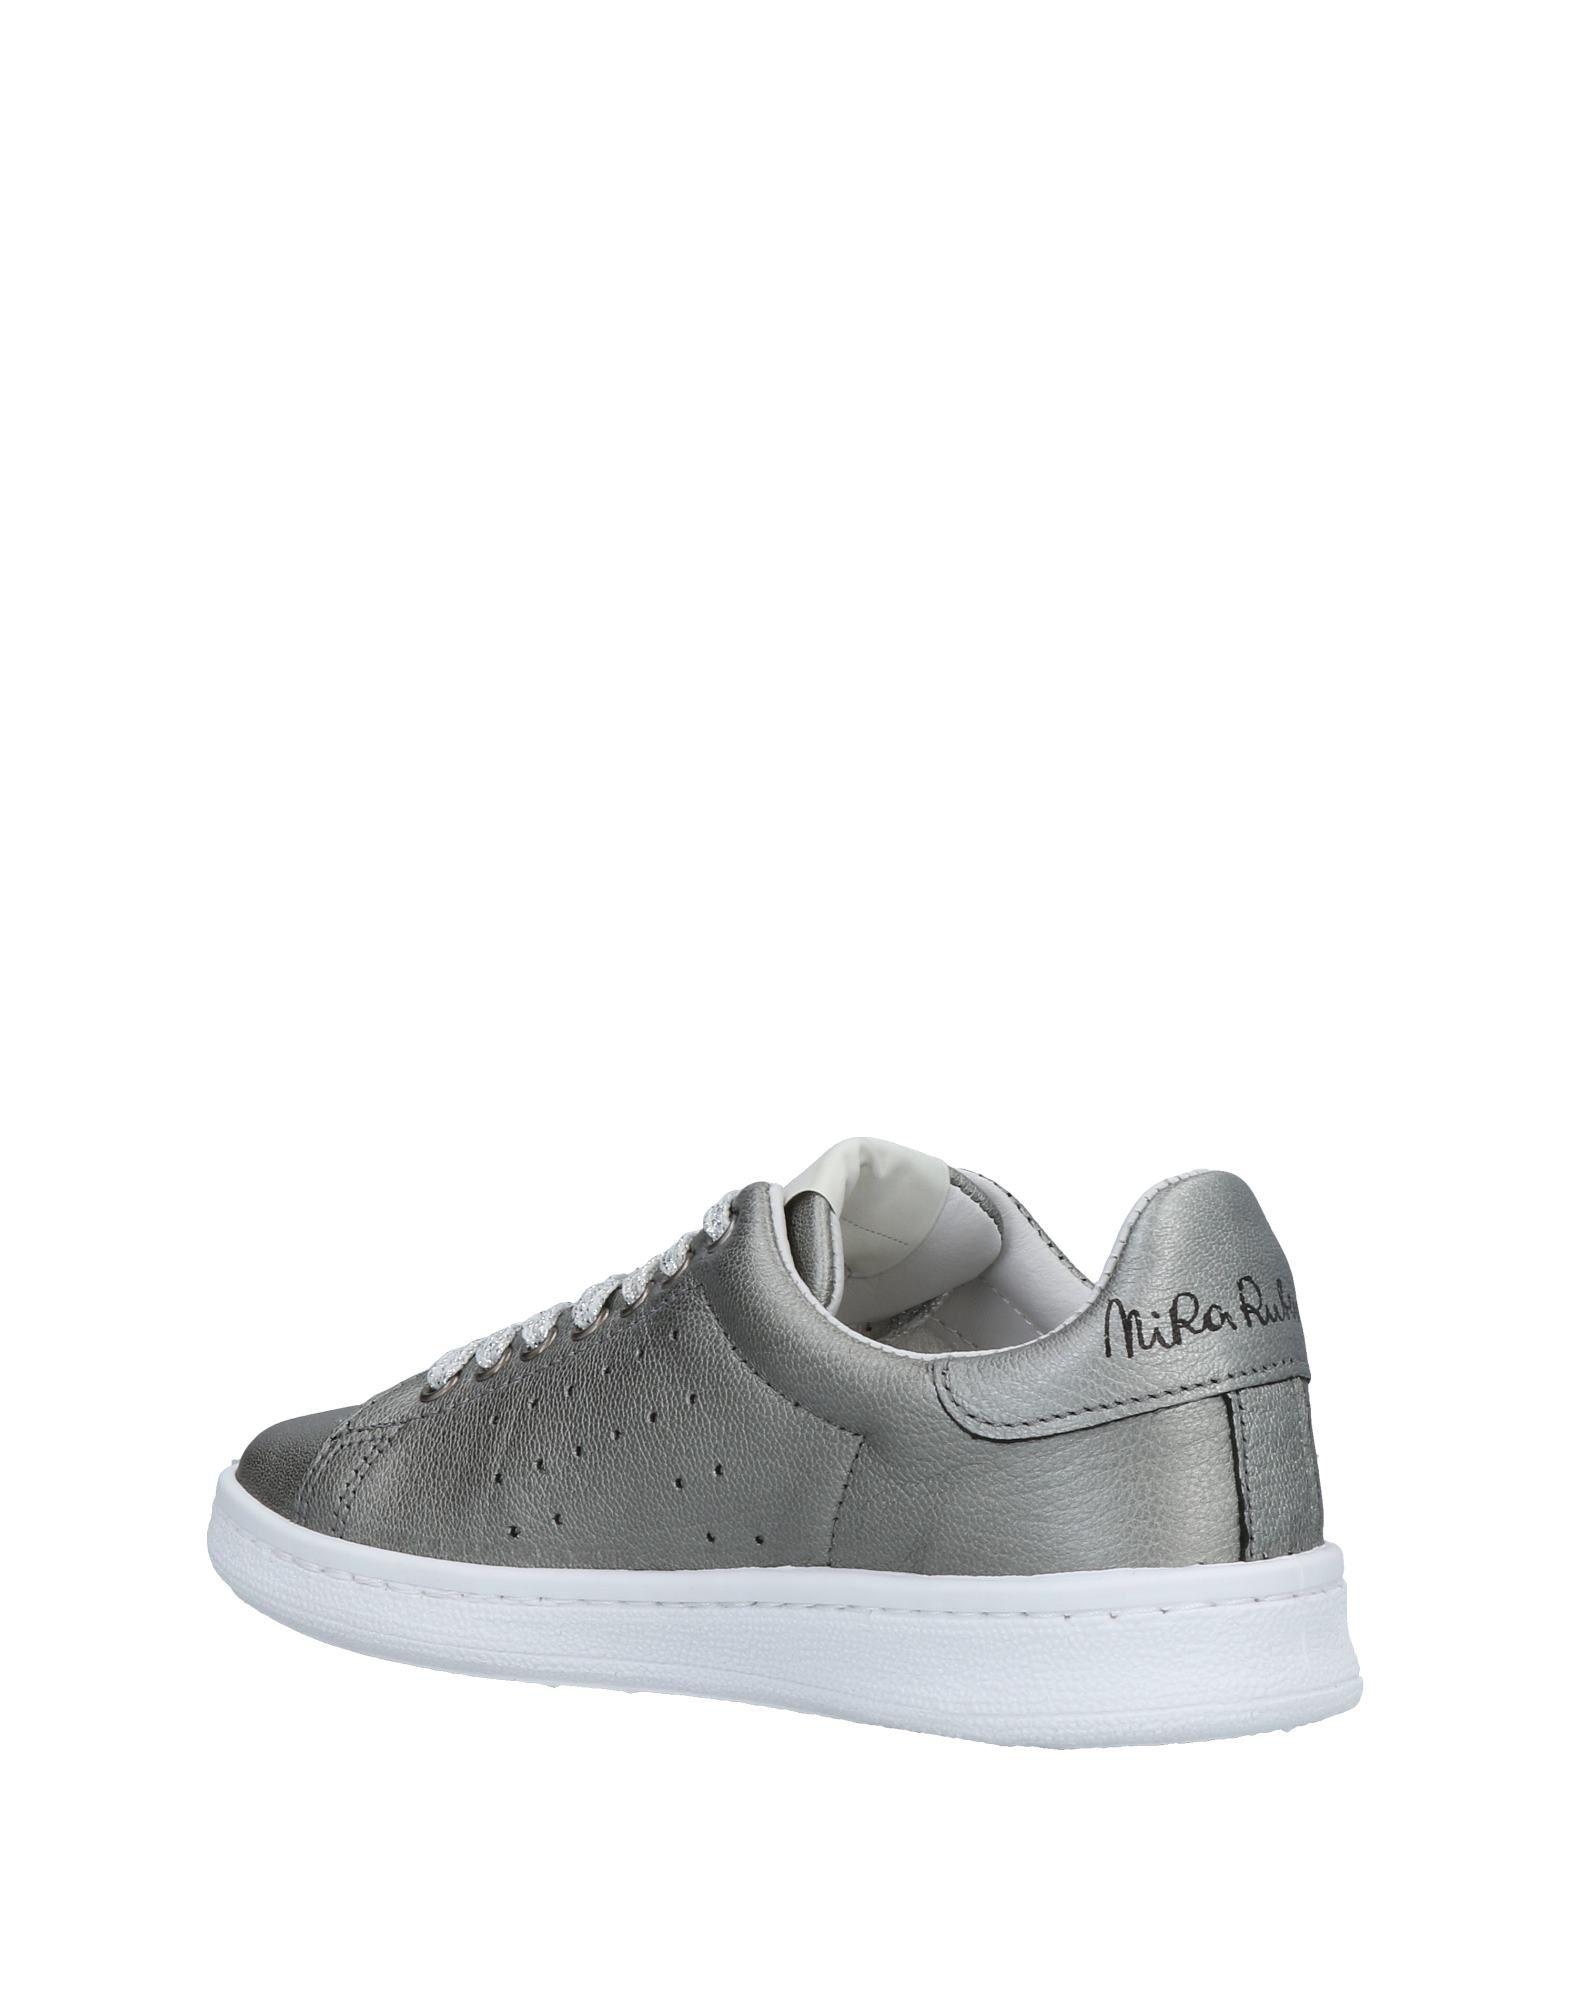 Gut um billige Schuhe Damen zu tragenNira Rubens Sneakers Damen Schuhe  11486099WA e86048